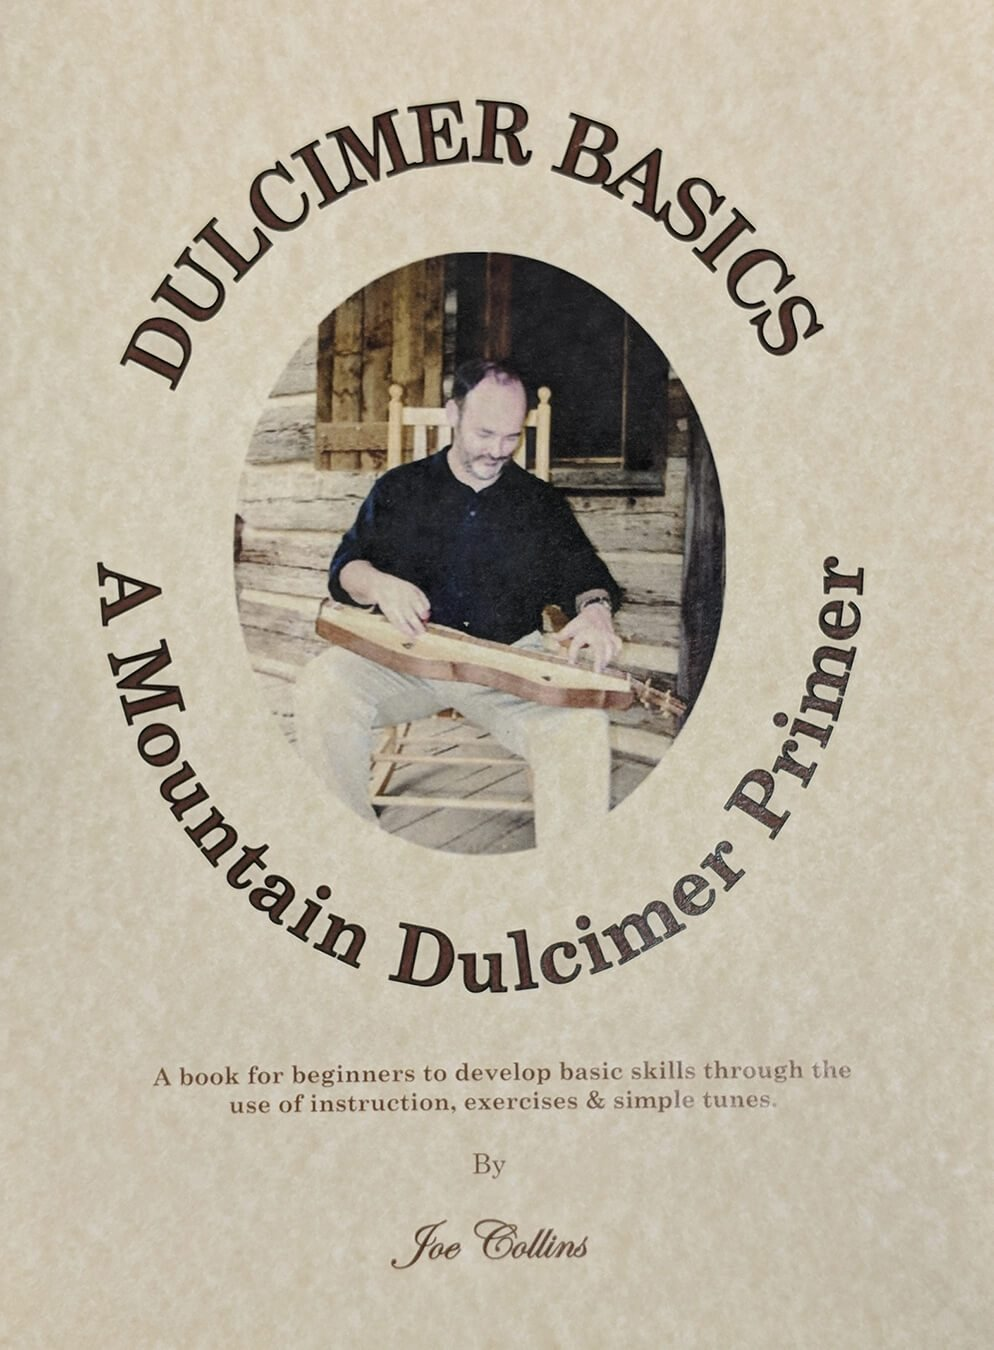 Joe Collins - Dulcimer Basics: A Mountain Dulcimer Primer